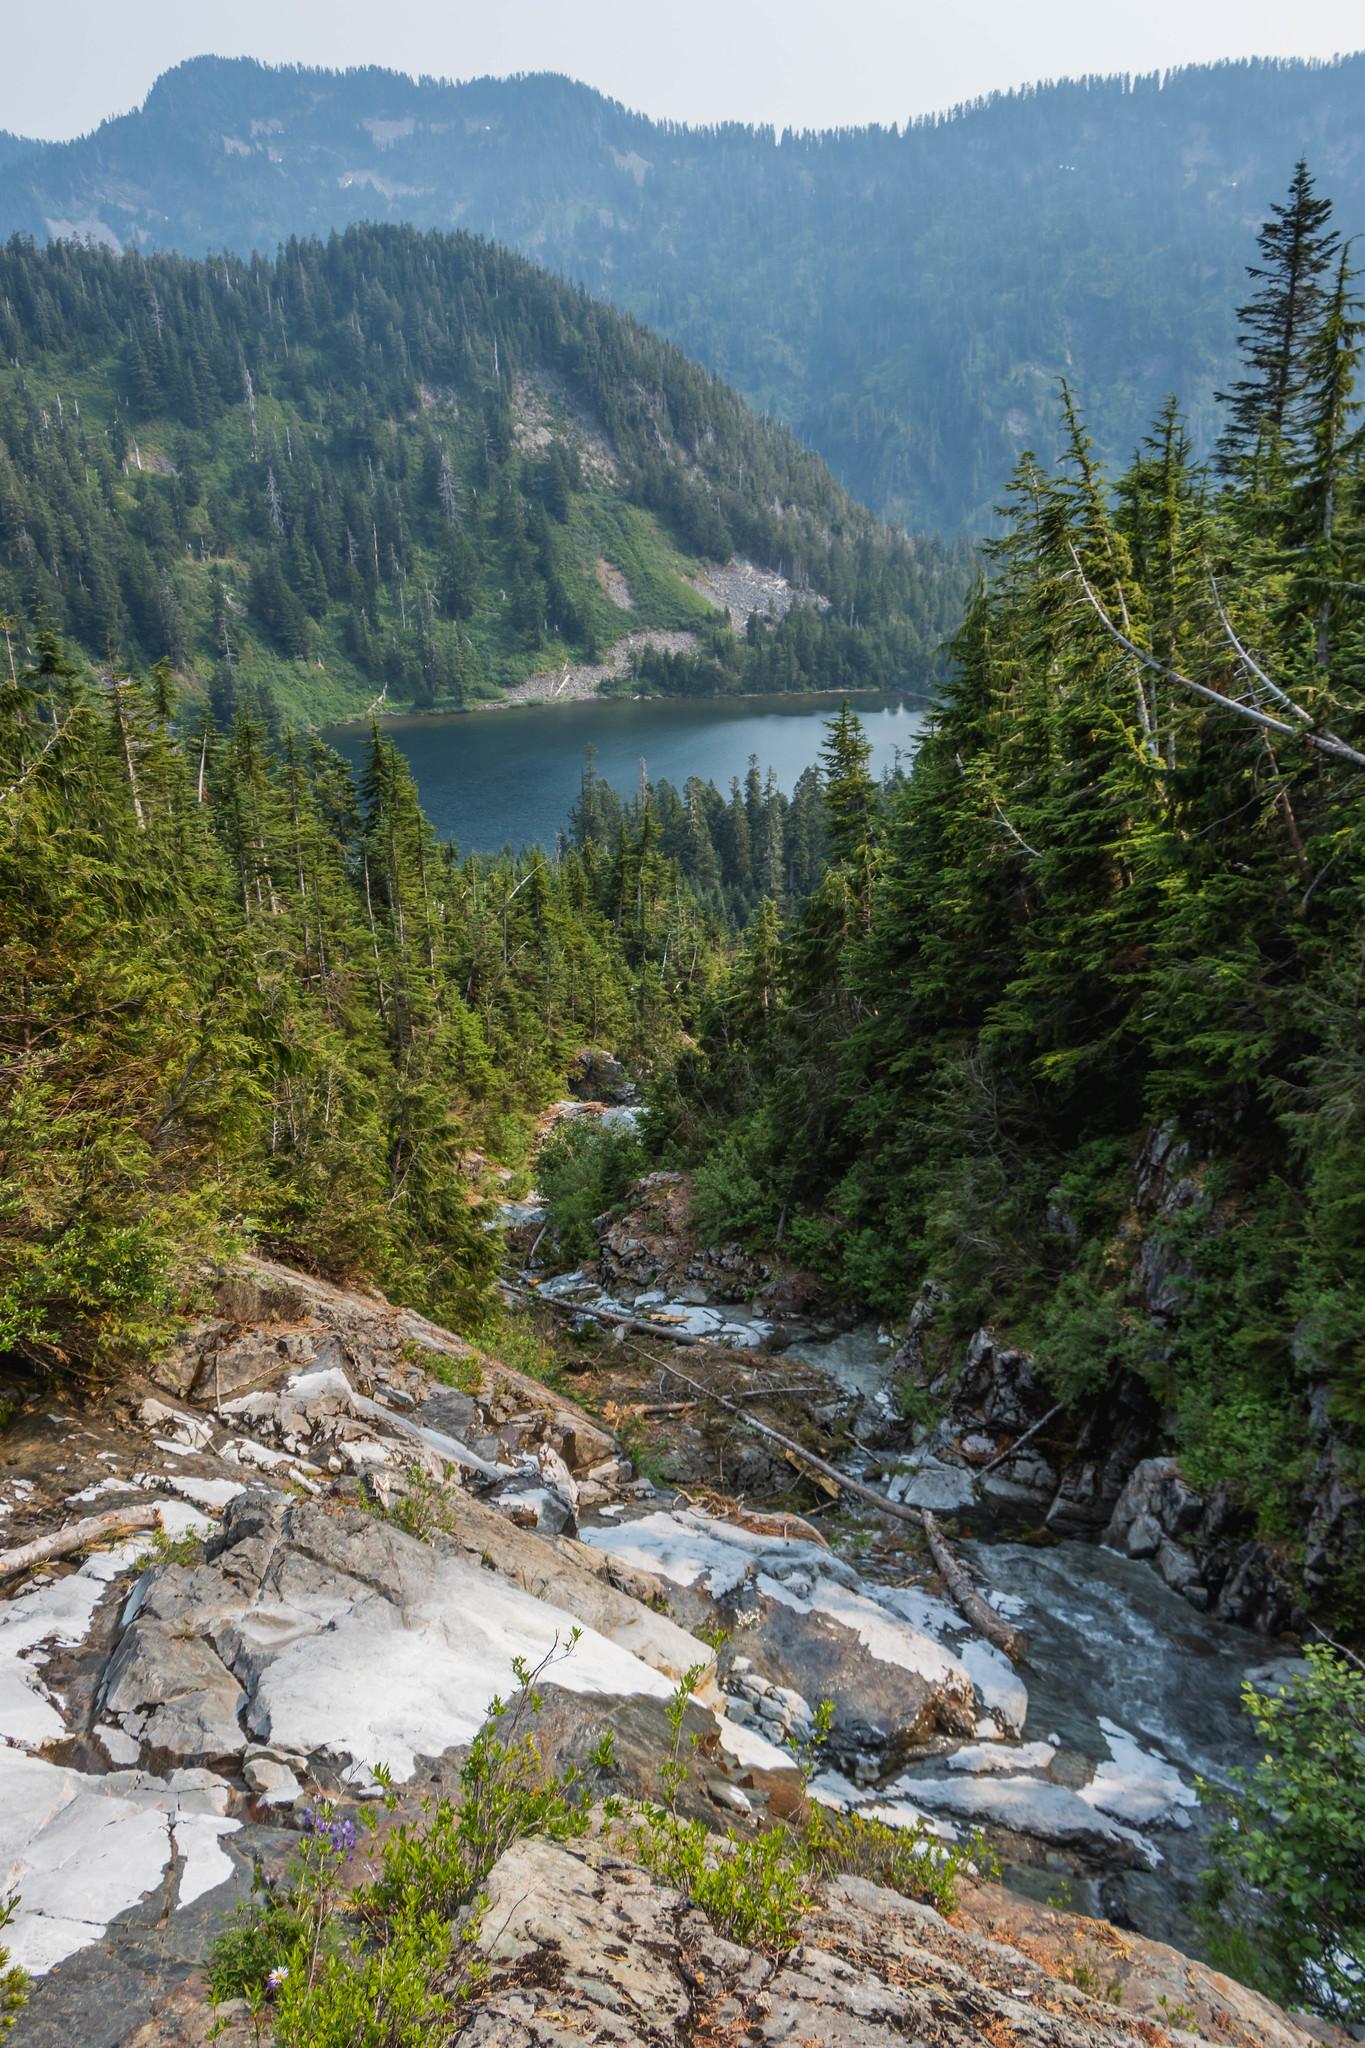 Taking the waterway to Crater Lake